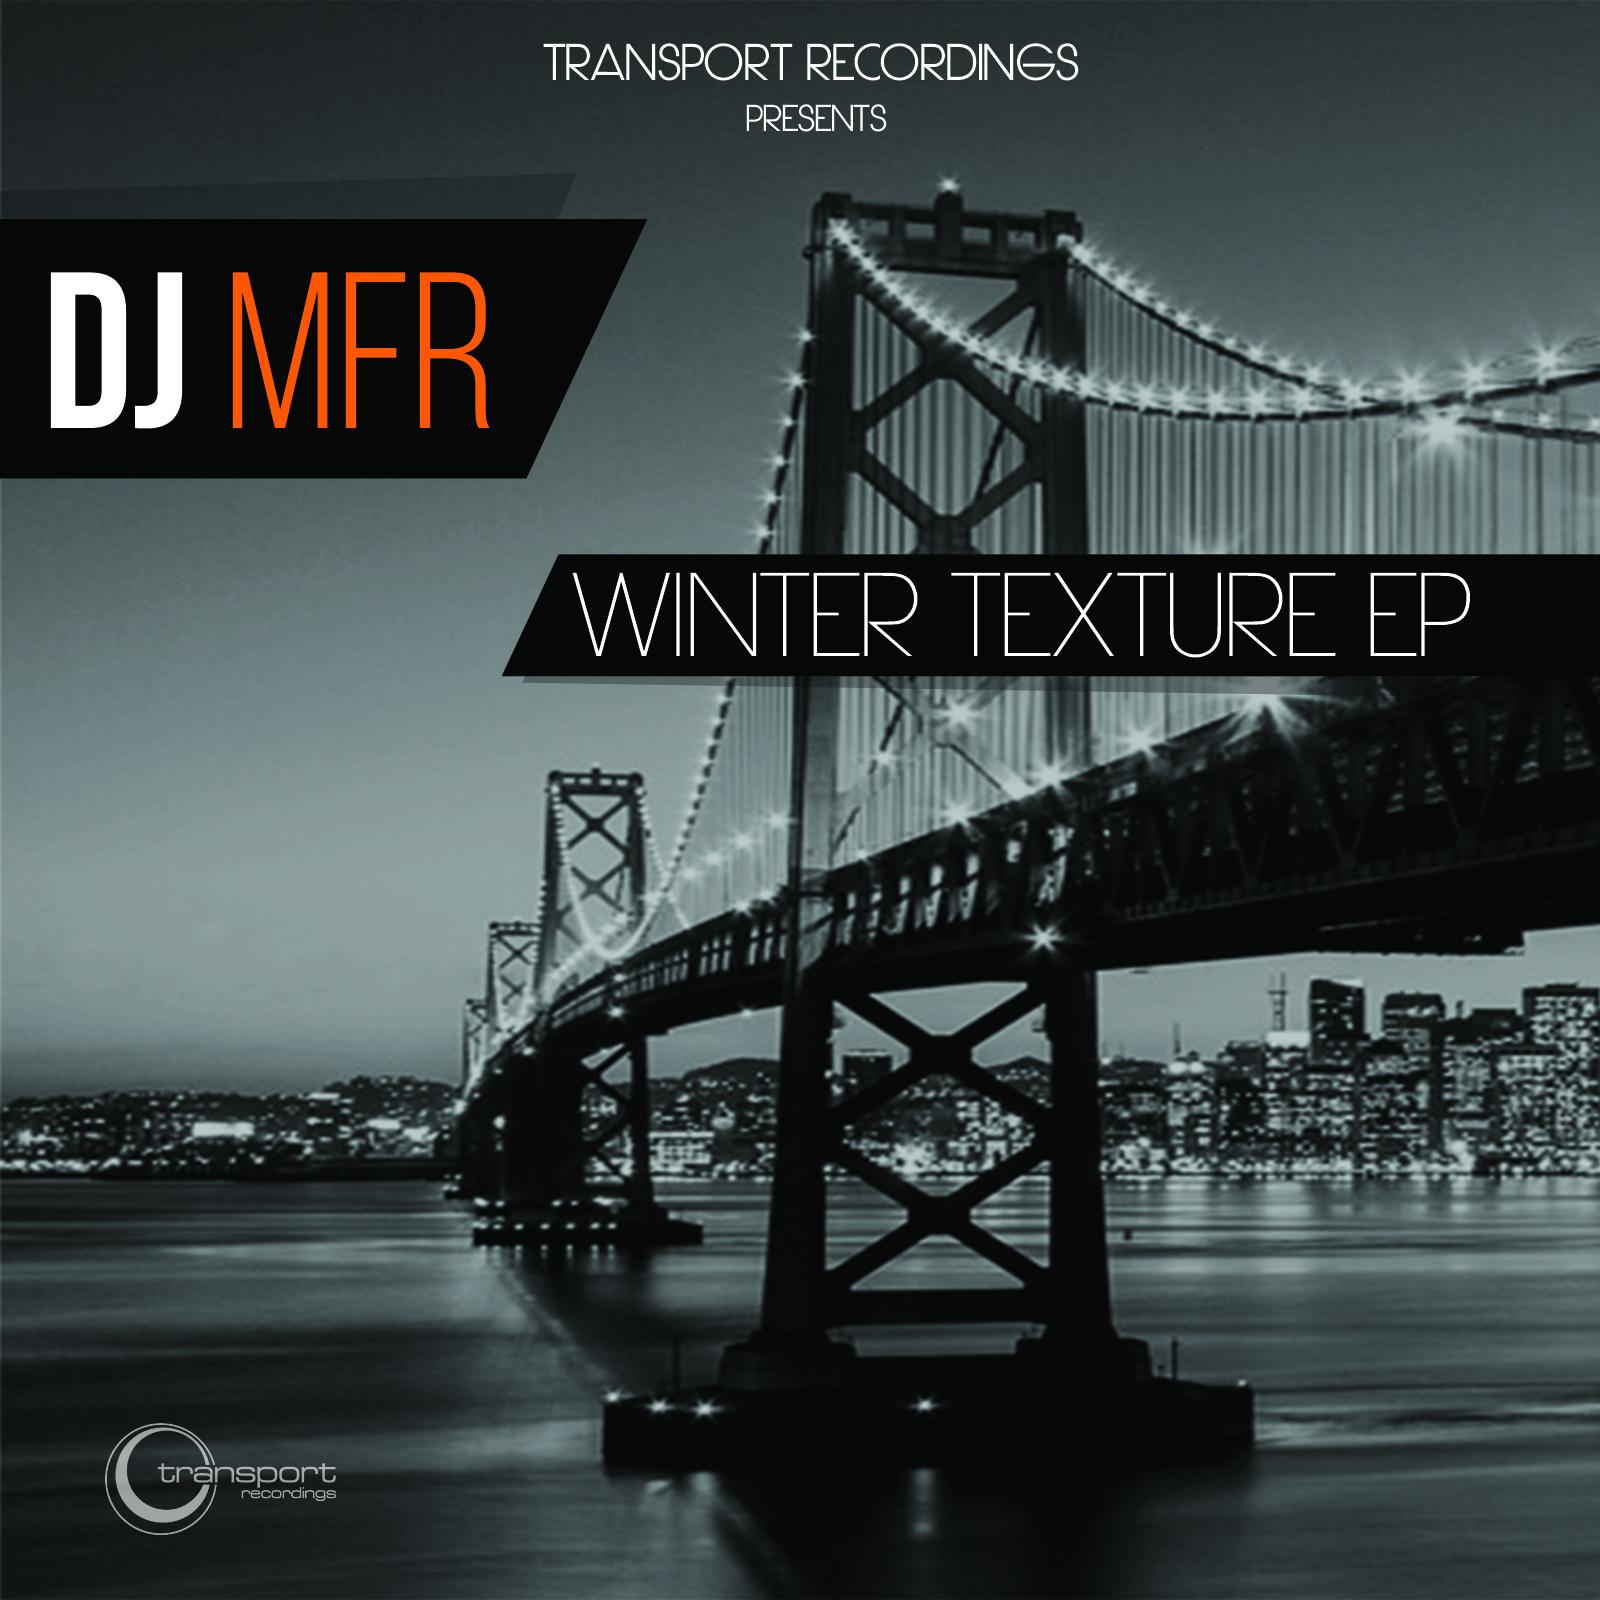 Winter Texture EP